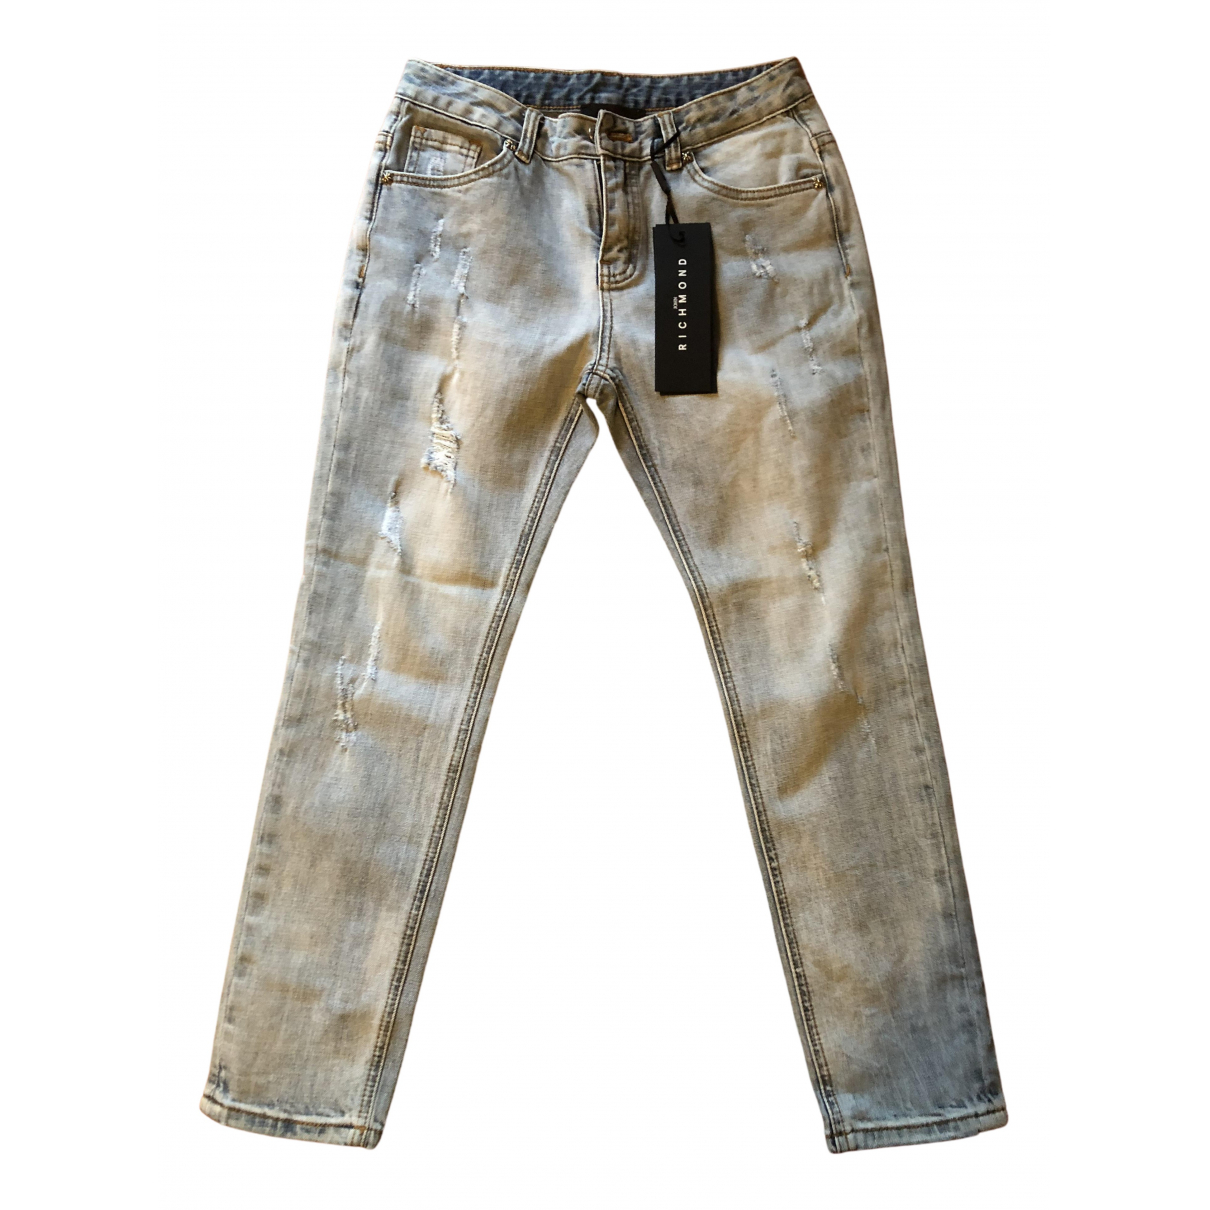 John Richmond \N Denim - Jeans Trousers for Kids 12 years - XS FR